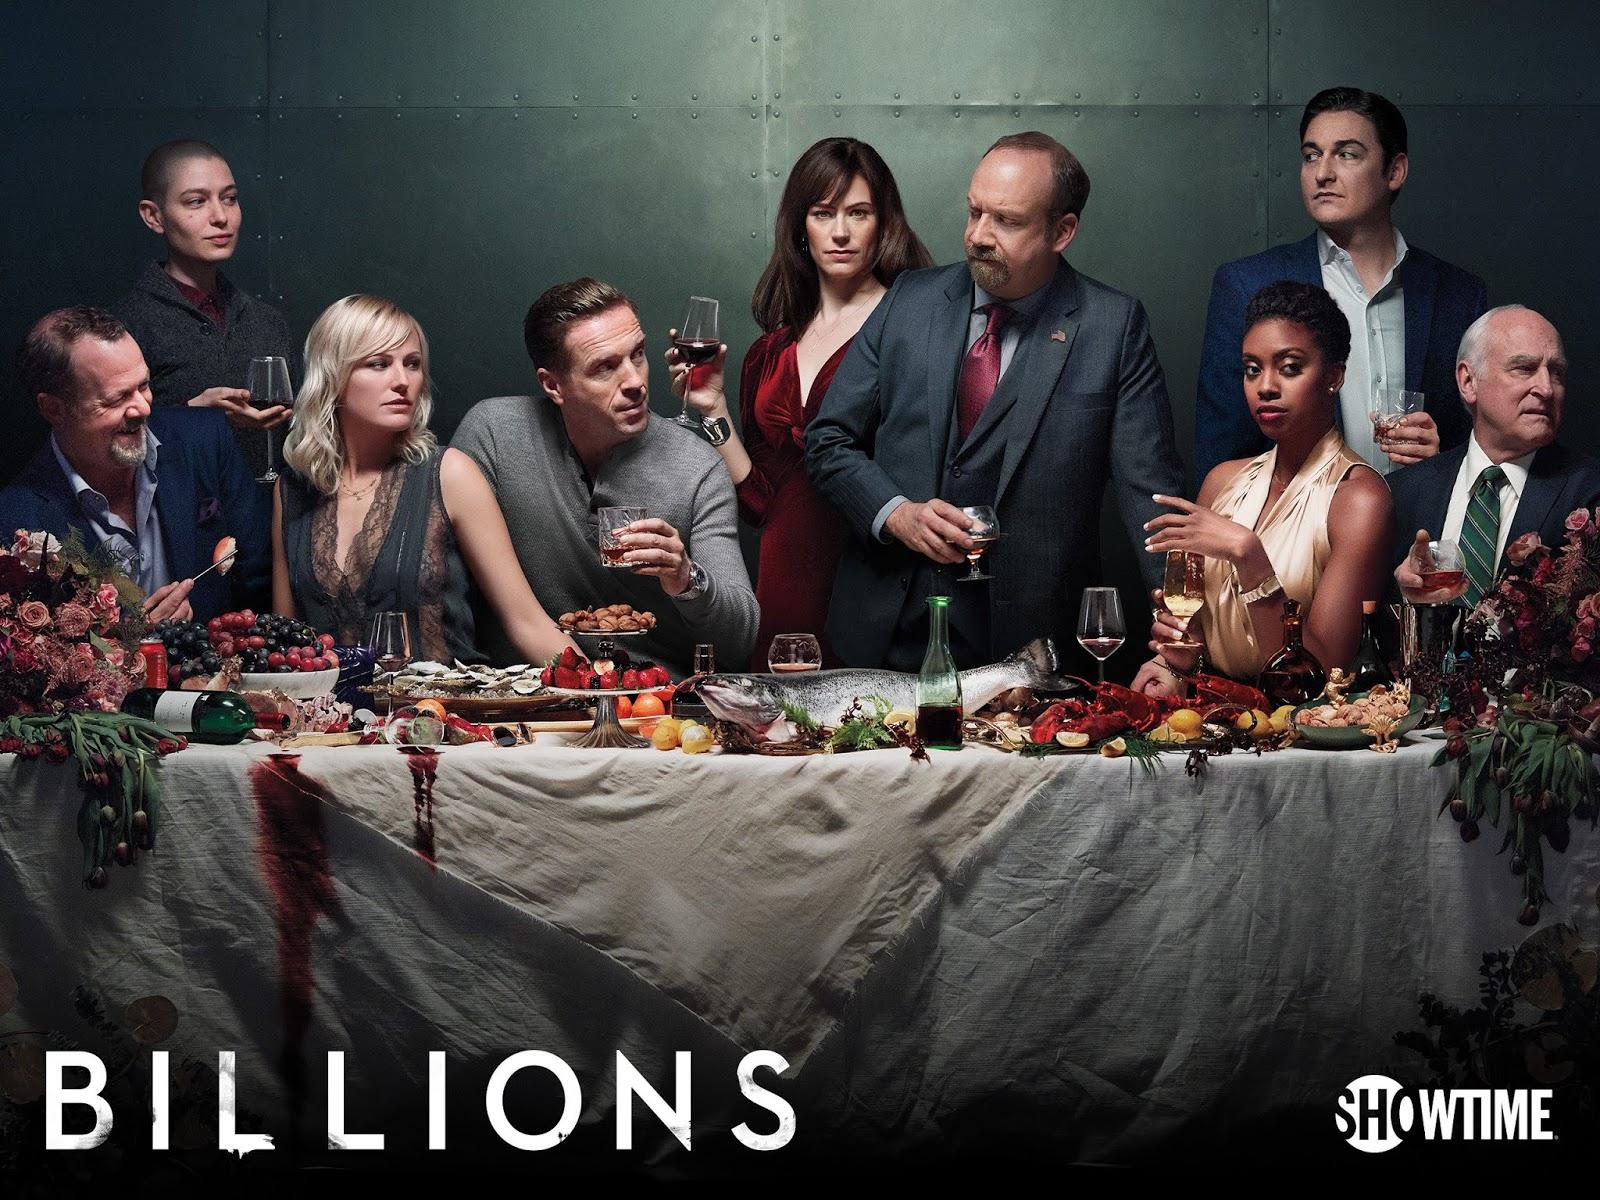 Billions season 3 (2018)